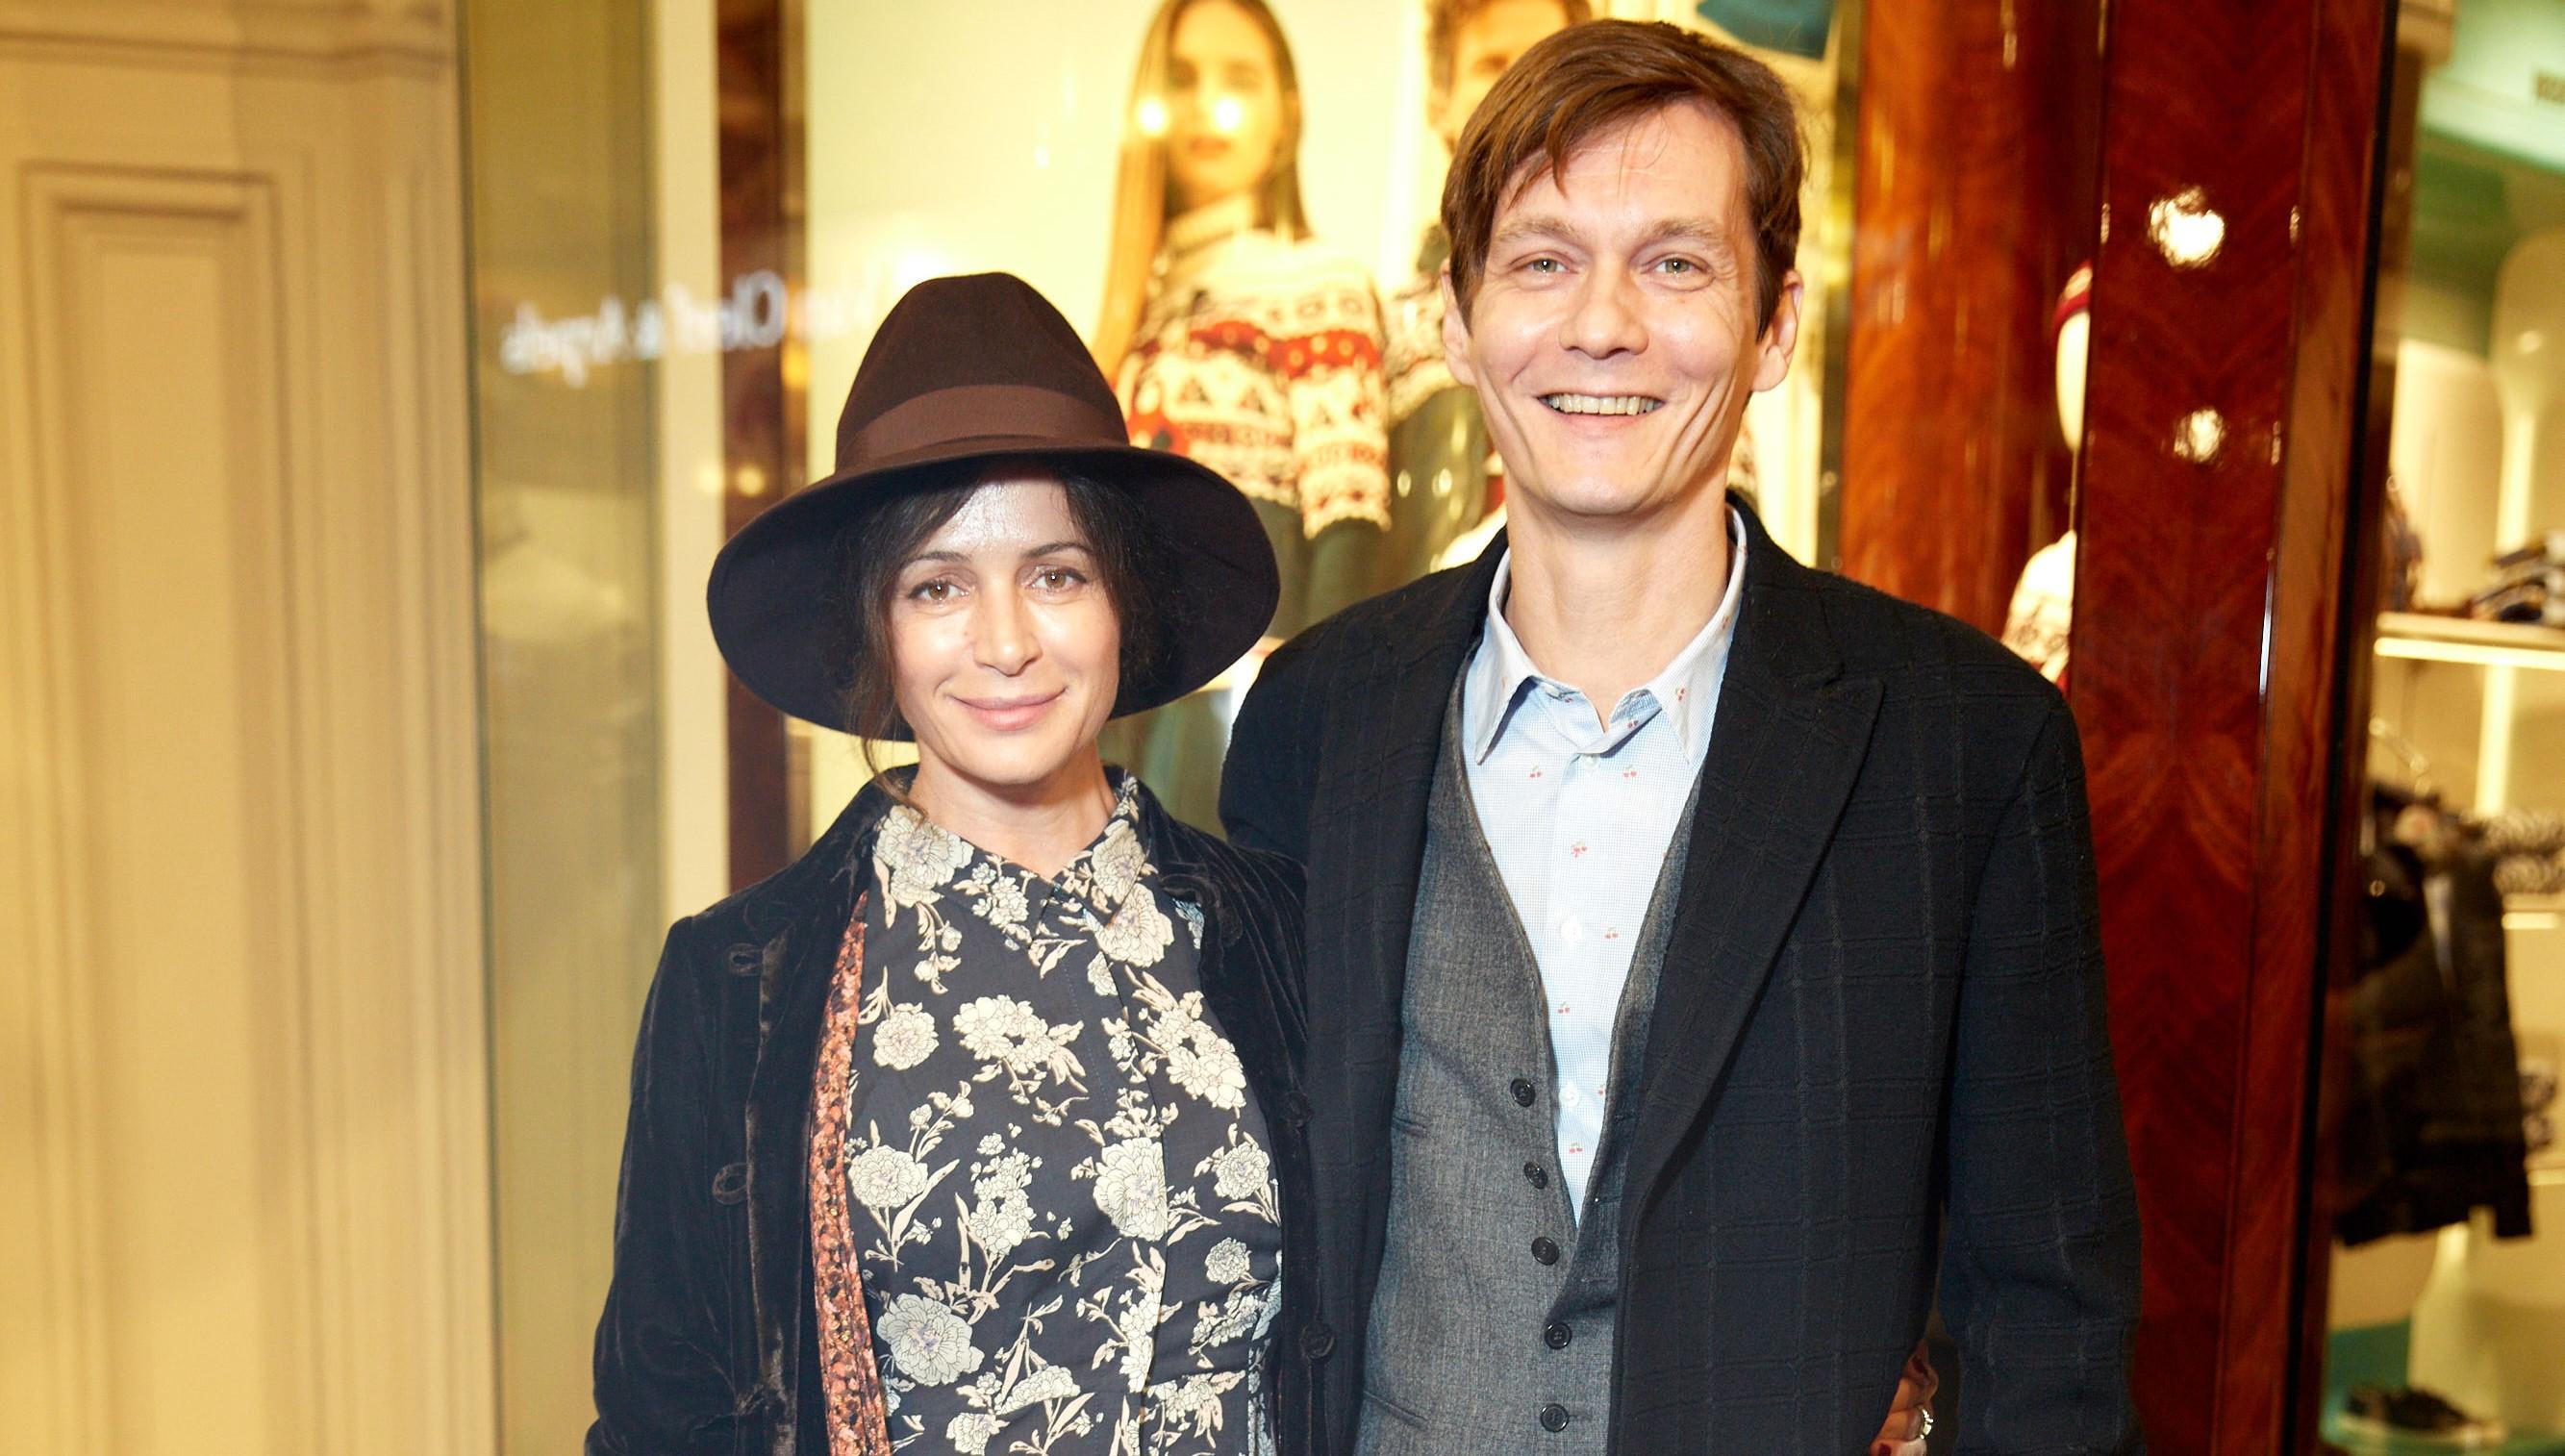 Оксана Фандера с мужем Филиппом Янковским